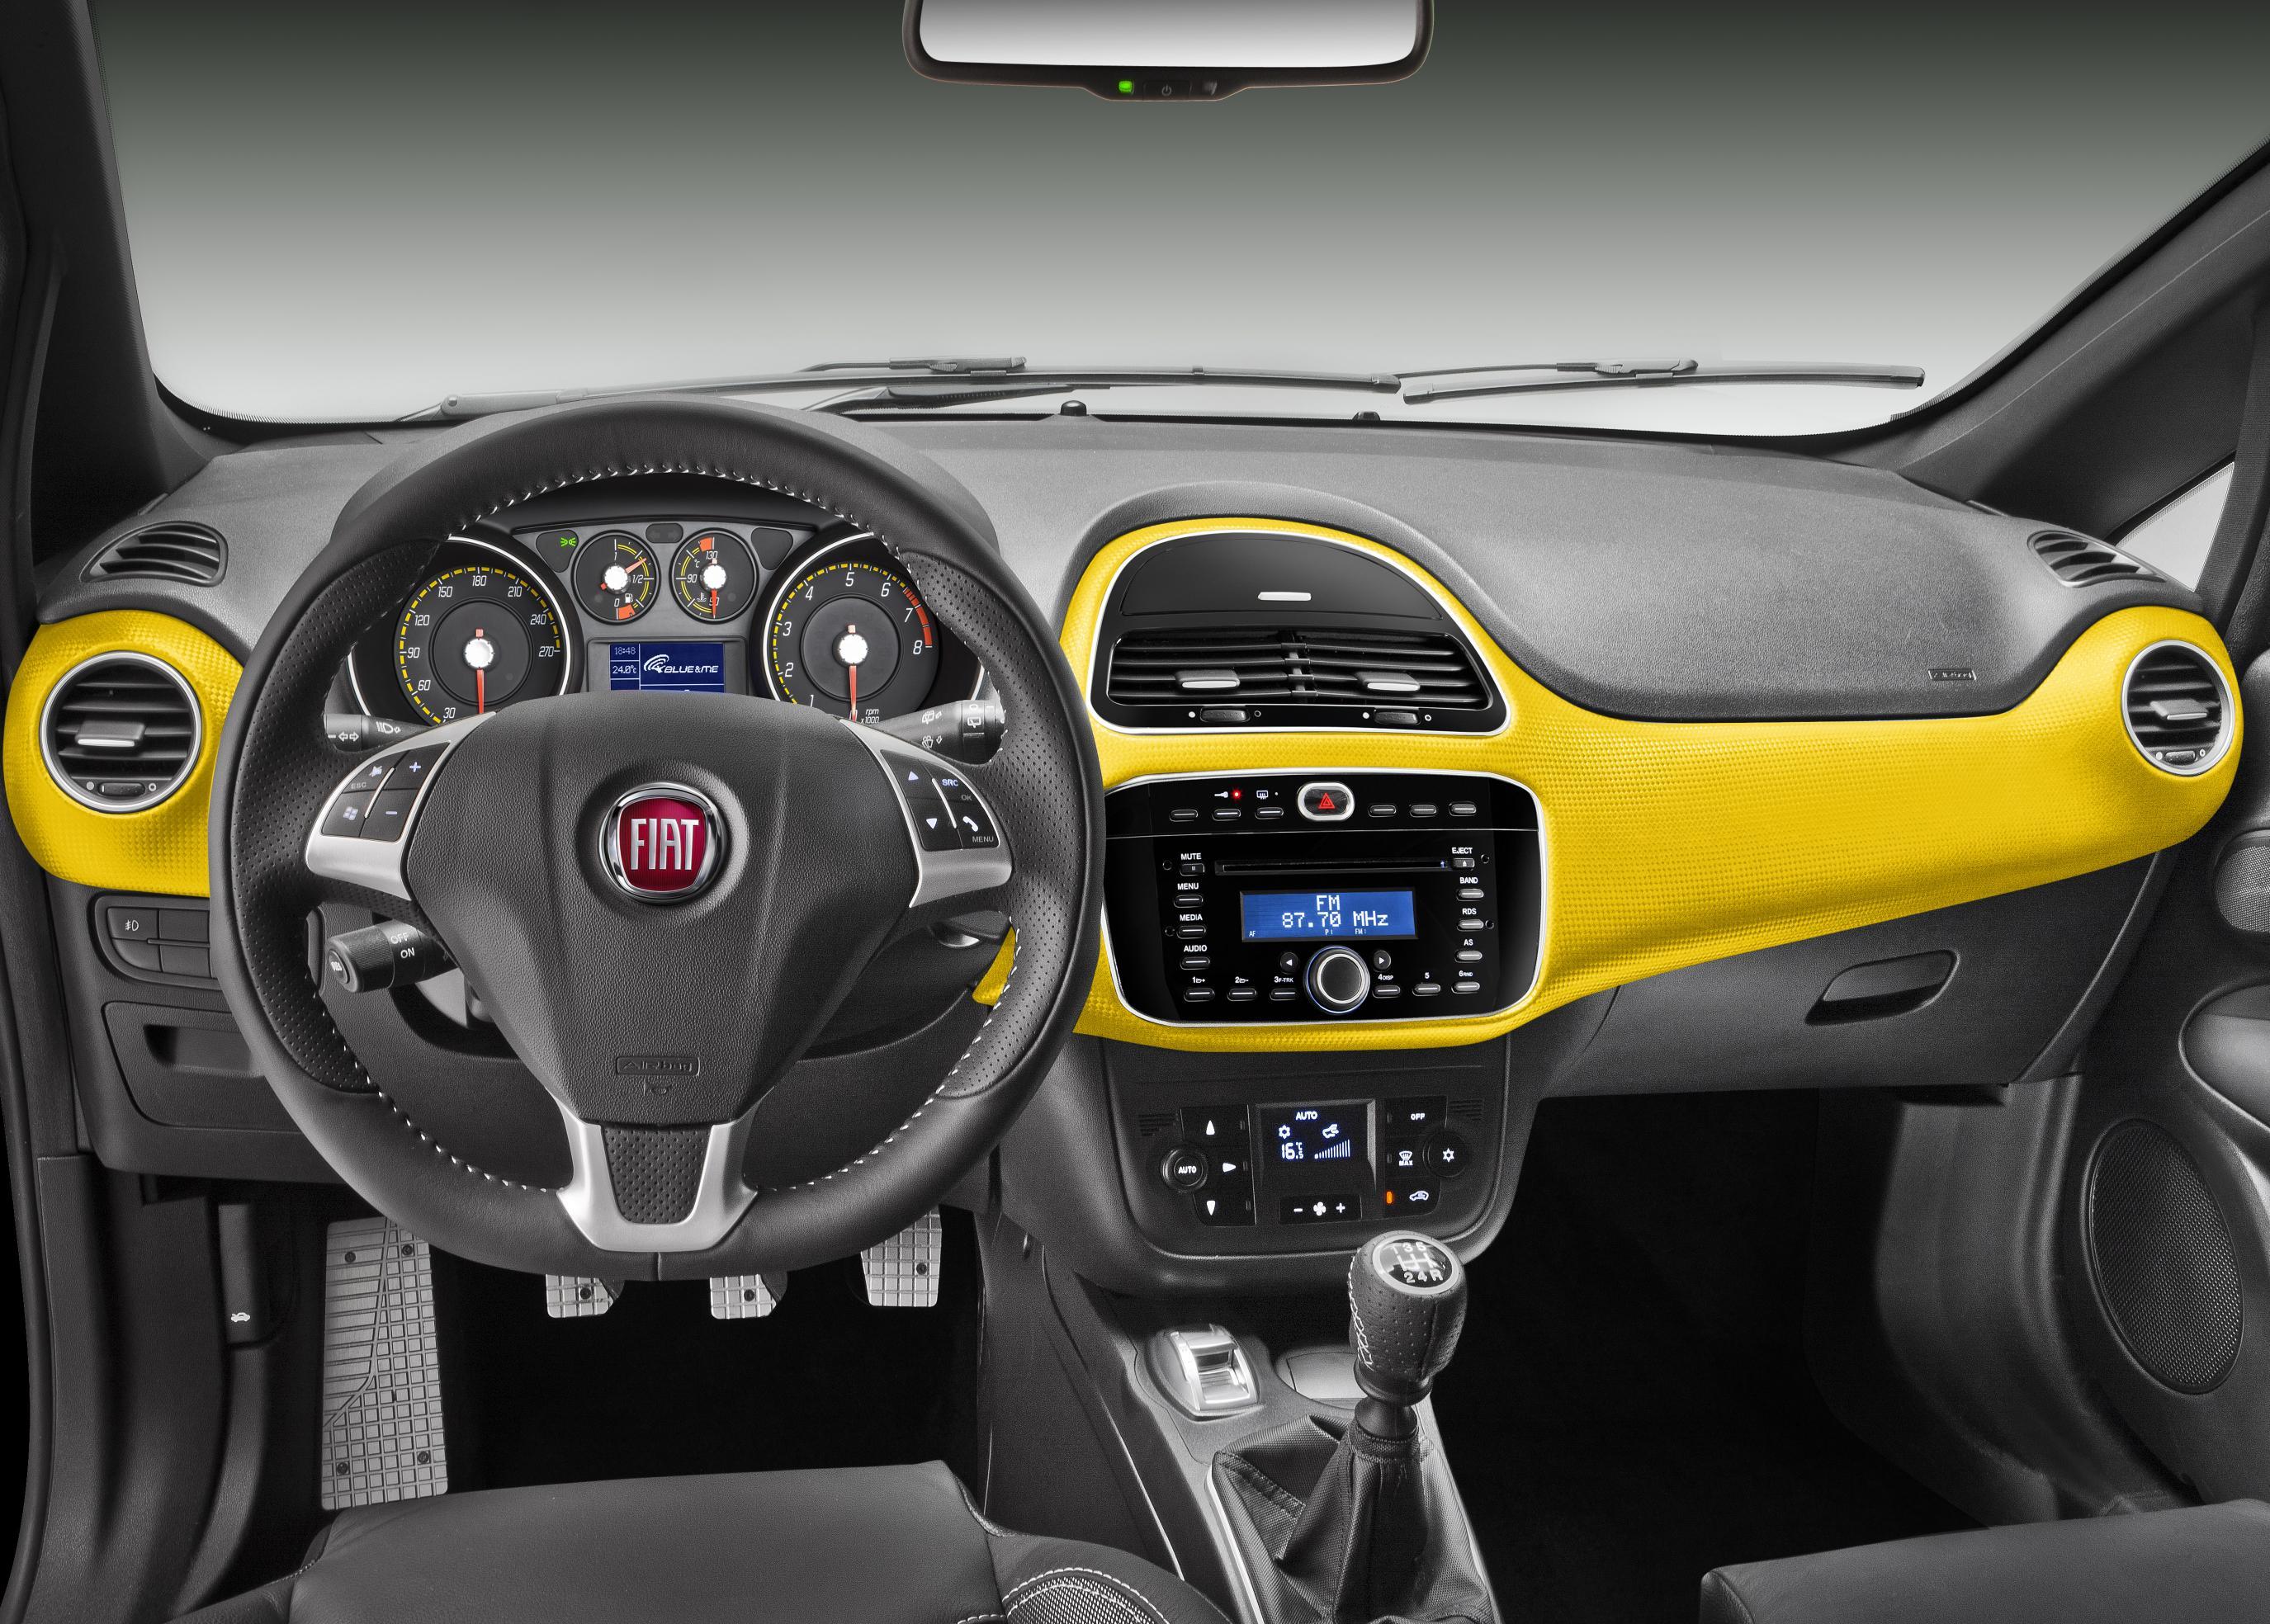 Novo Fiat Punto 2013 Fotos interior